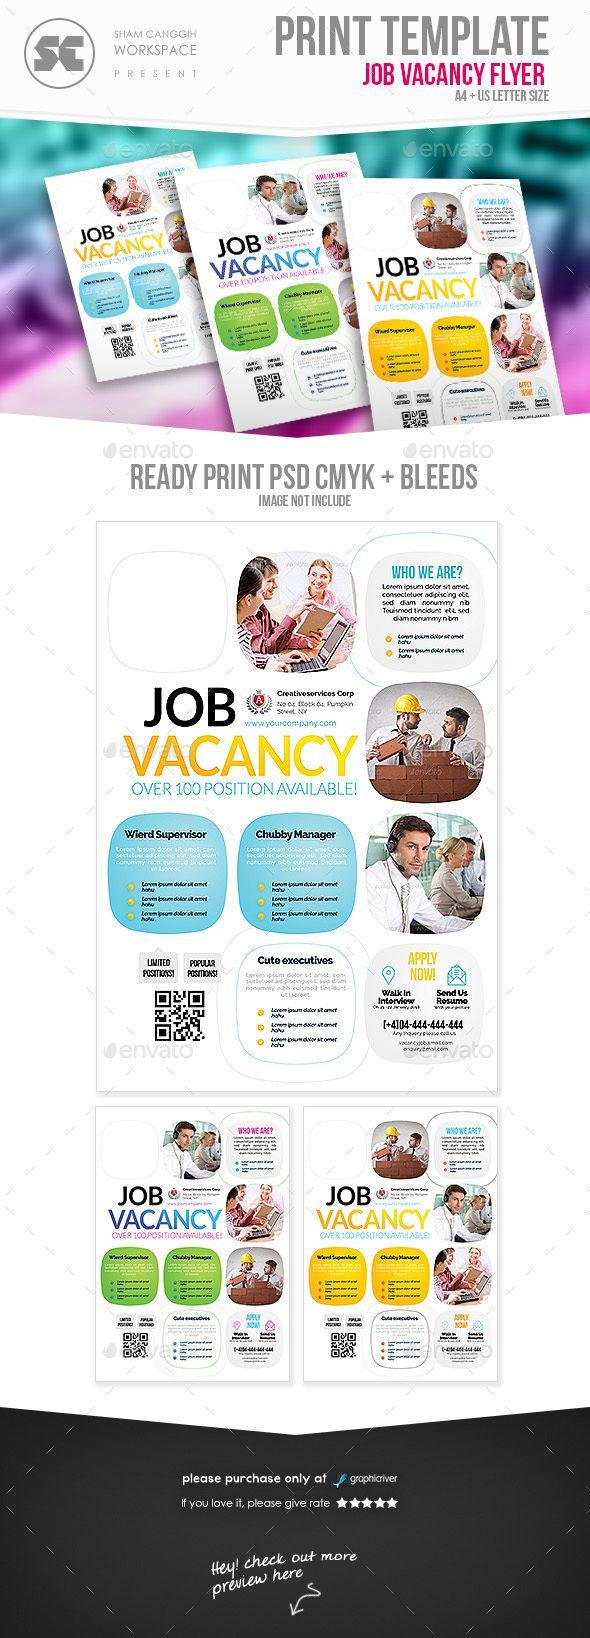 Job Vacancy Flyer Pinterest Flyer Template Template And Logos